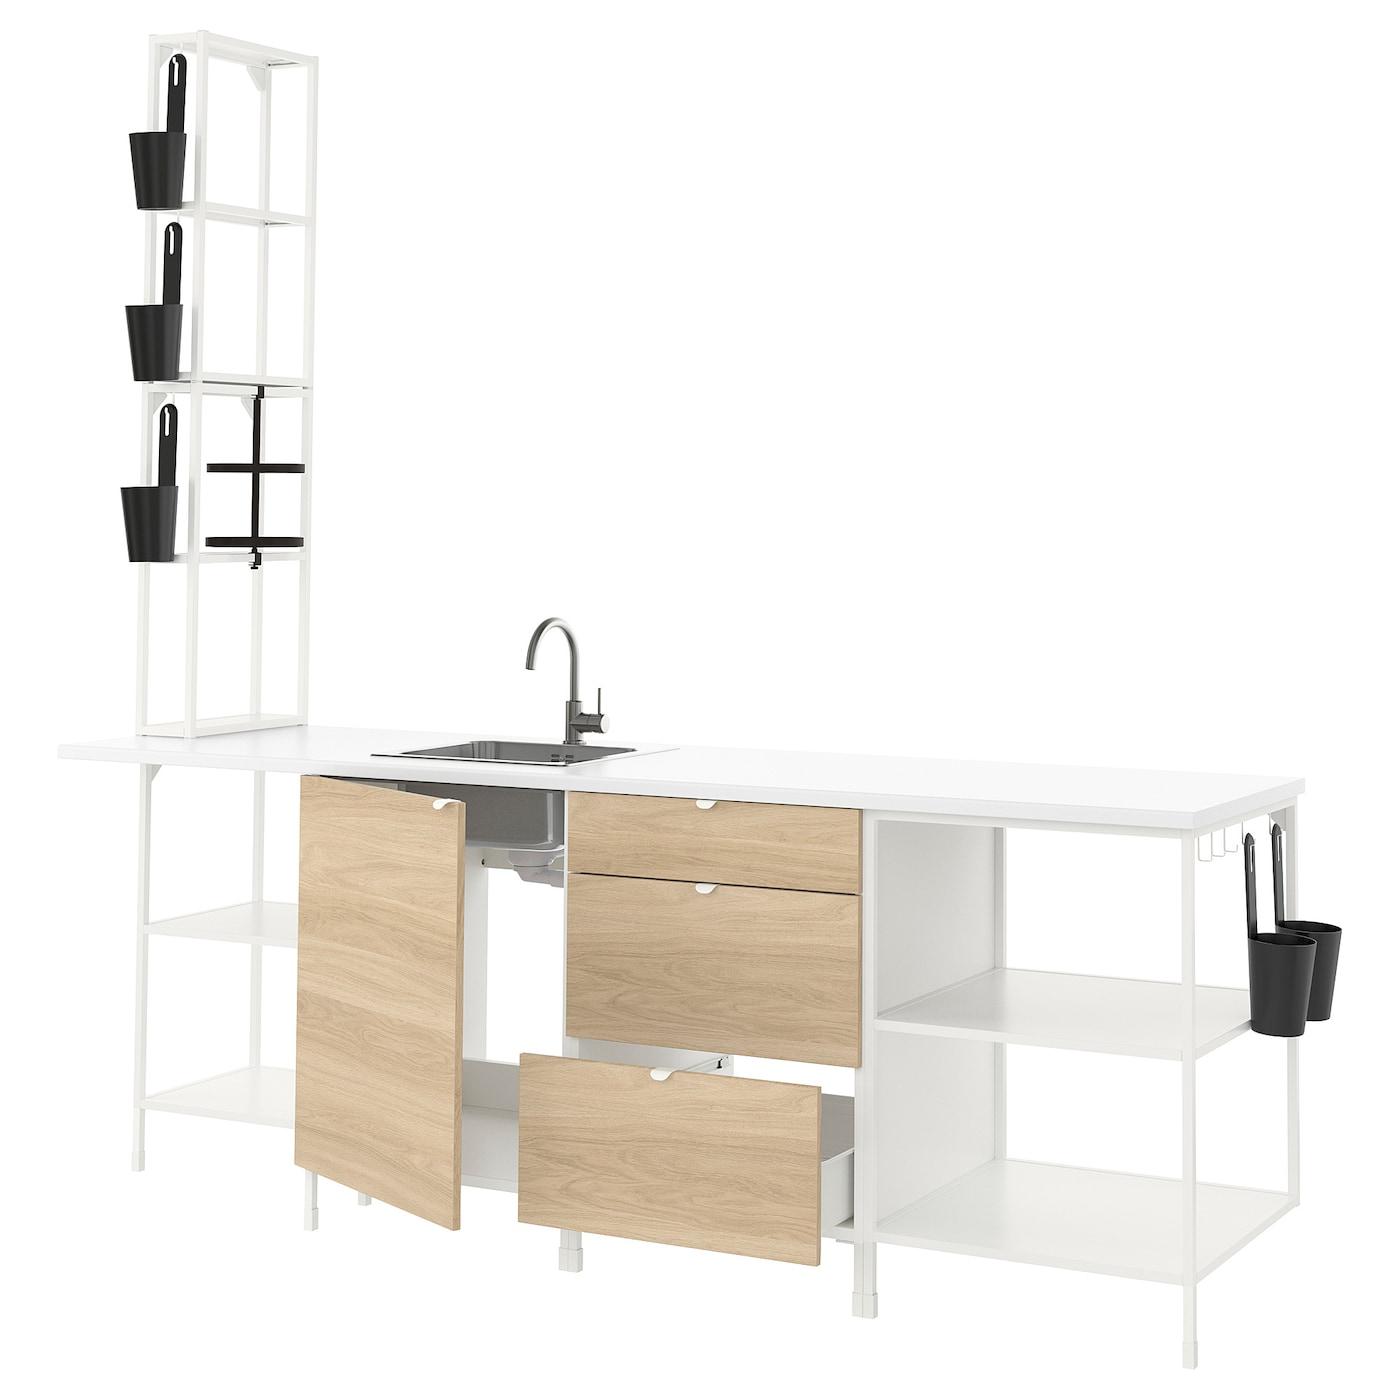 ENHET Cucina - bianco/effetto rovere - IKEA Svizzera